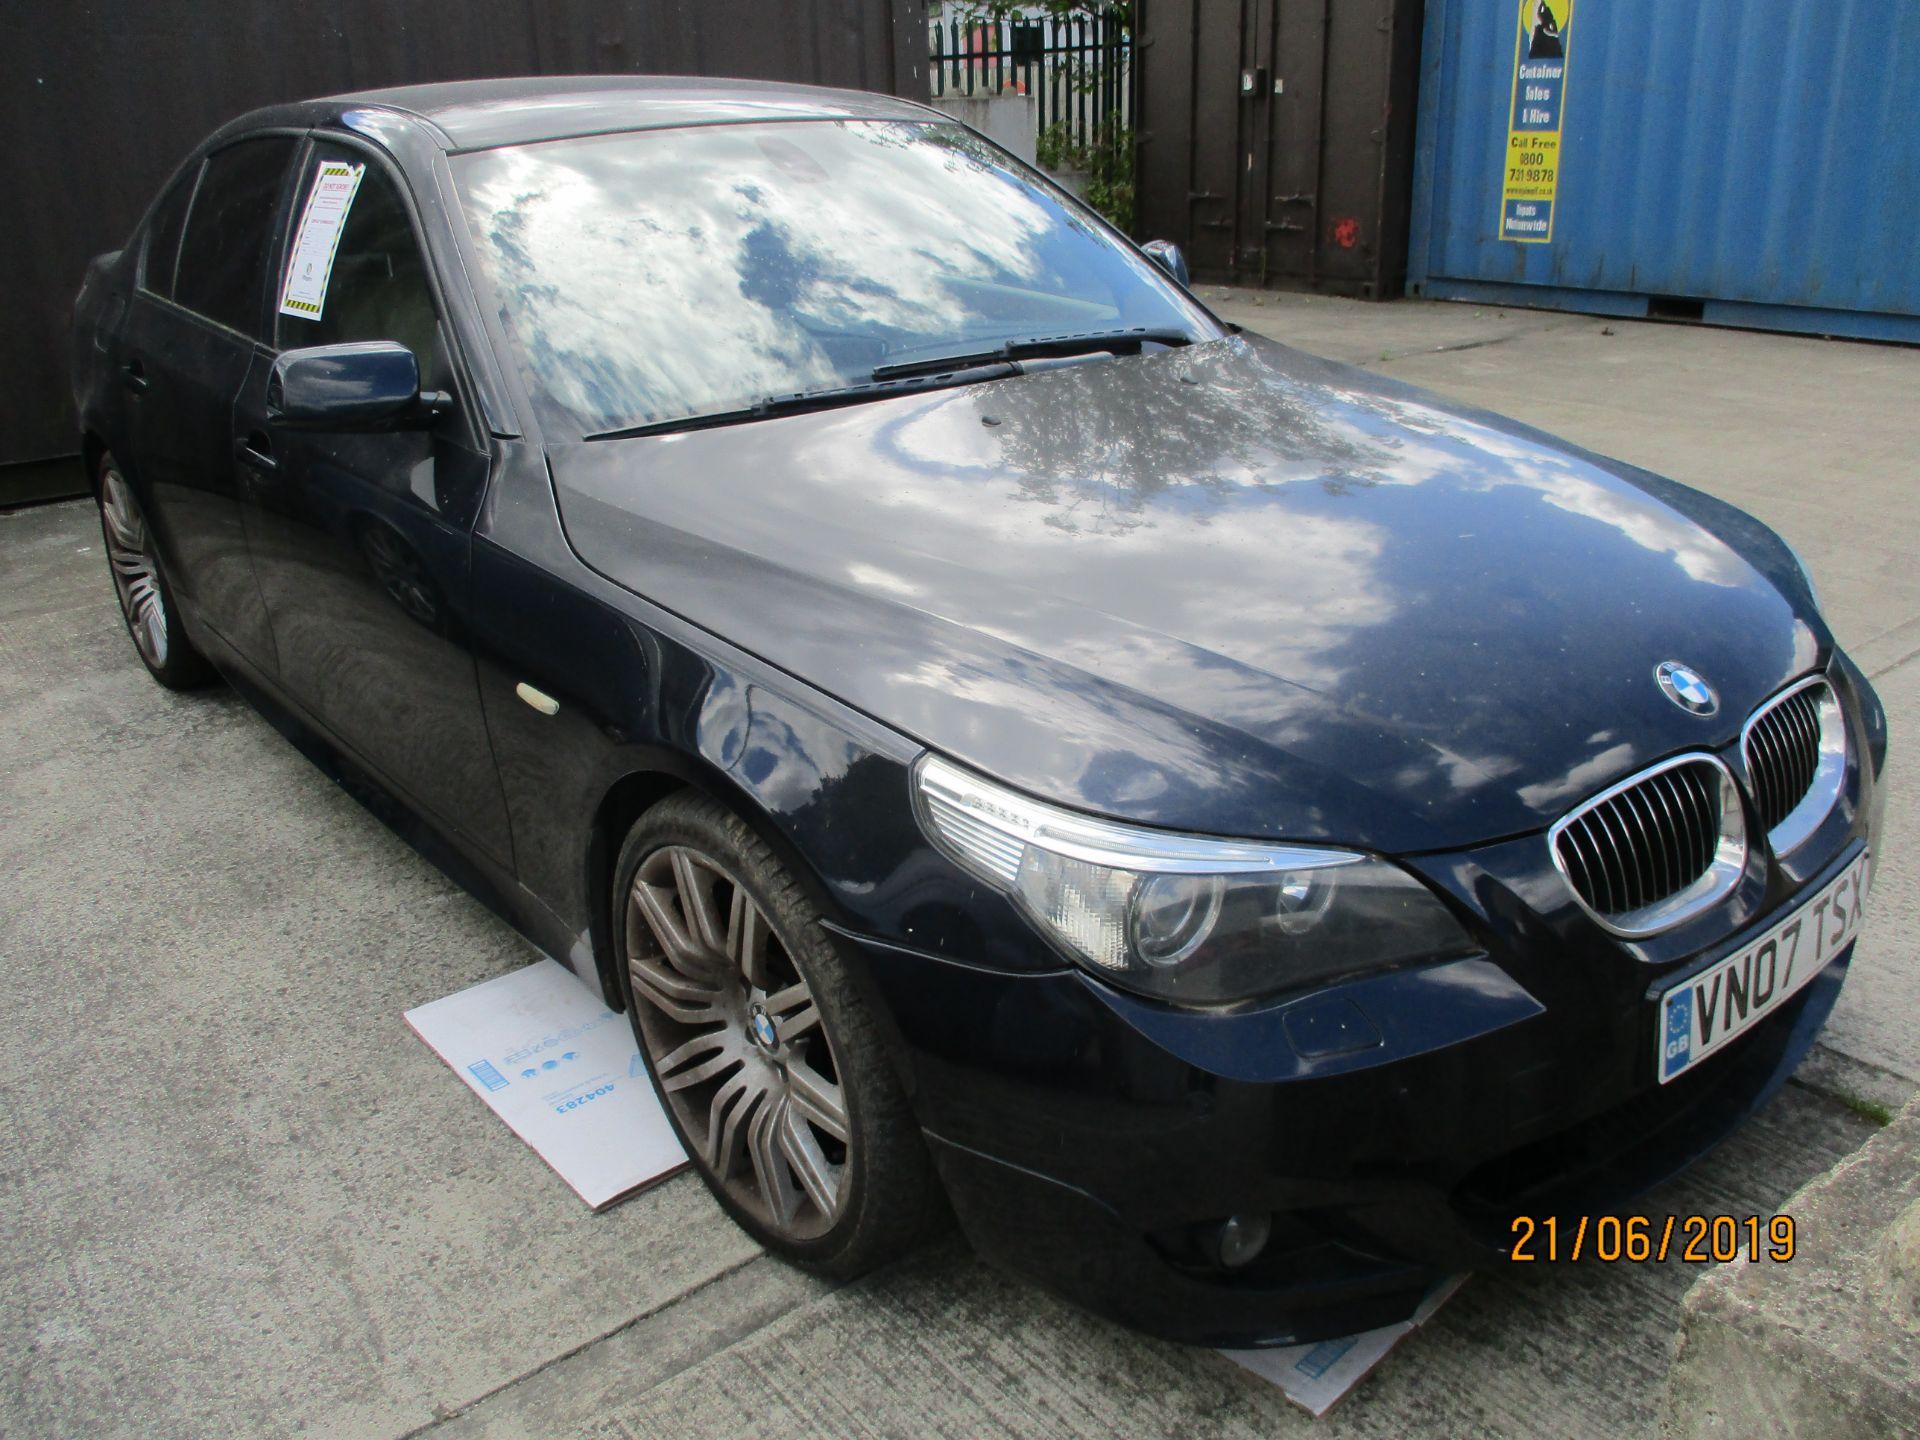 Lot 3 - BMW 530 DM SPORT automatic 4 door saloon - diesel - black Reg. No: VN07 TSX Rec.